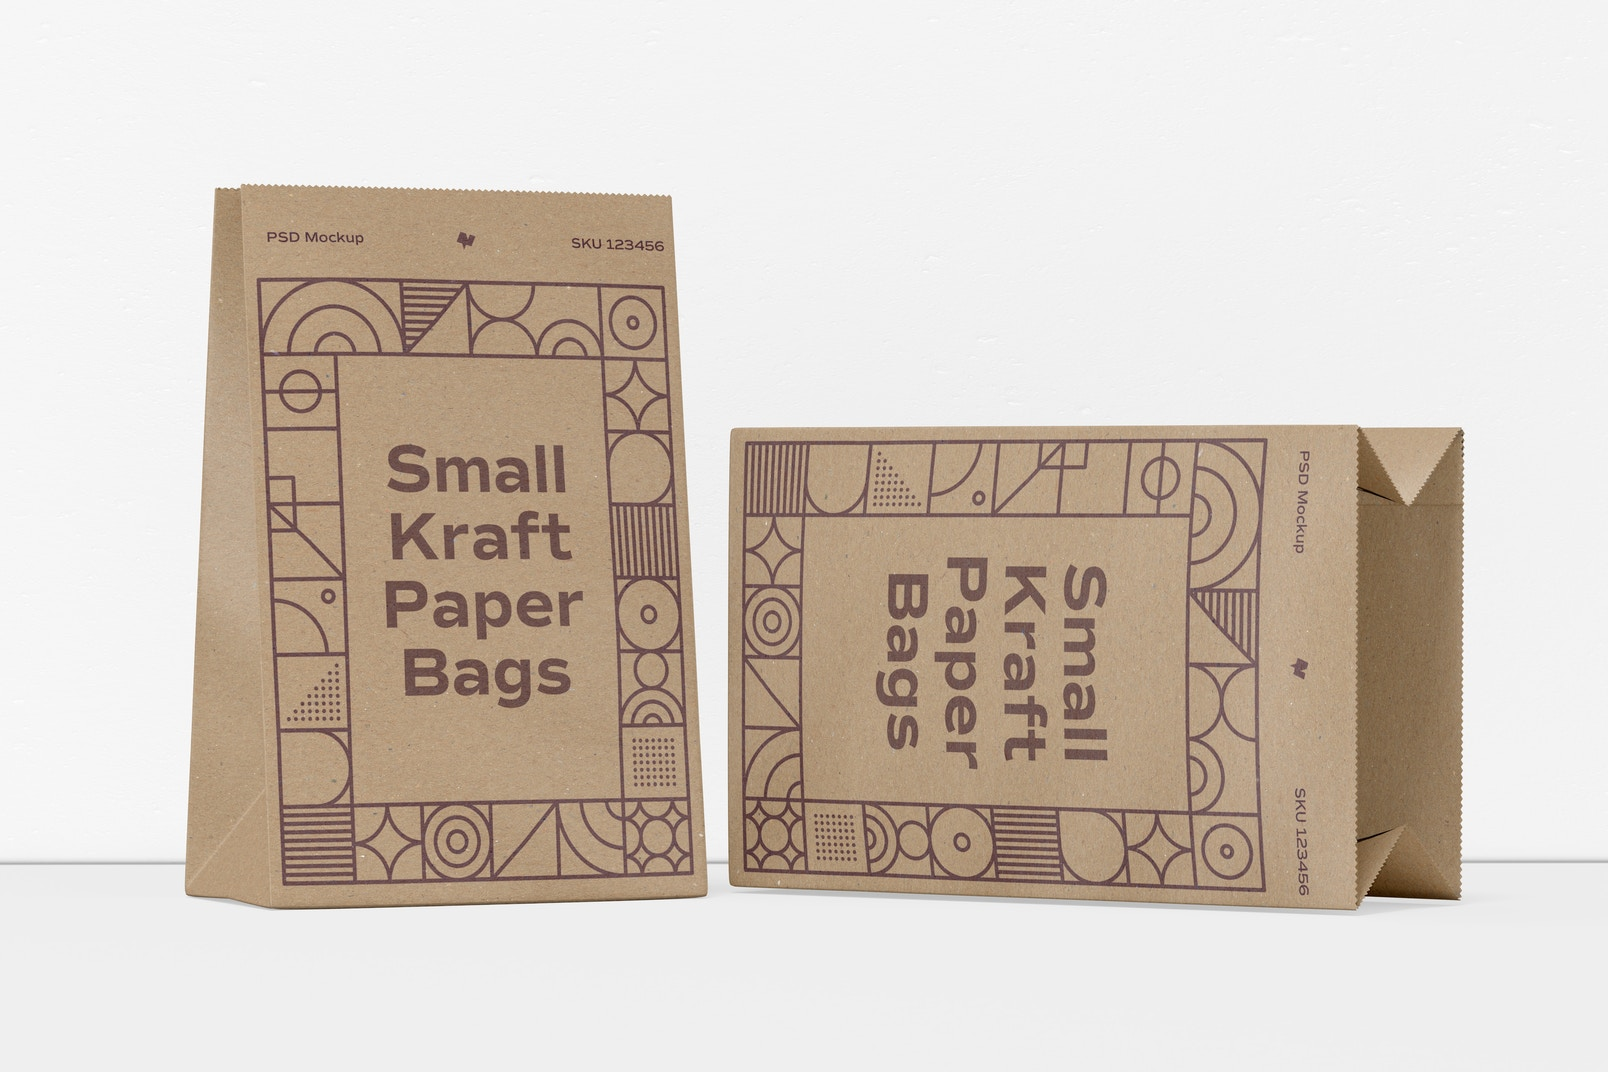 Small Kraft Paper Bags Mockup, Dropped